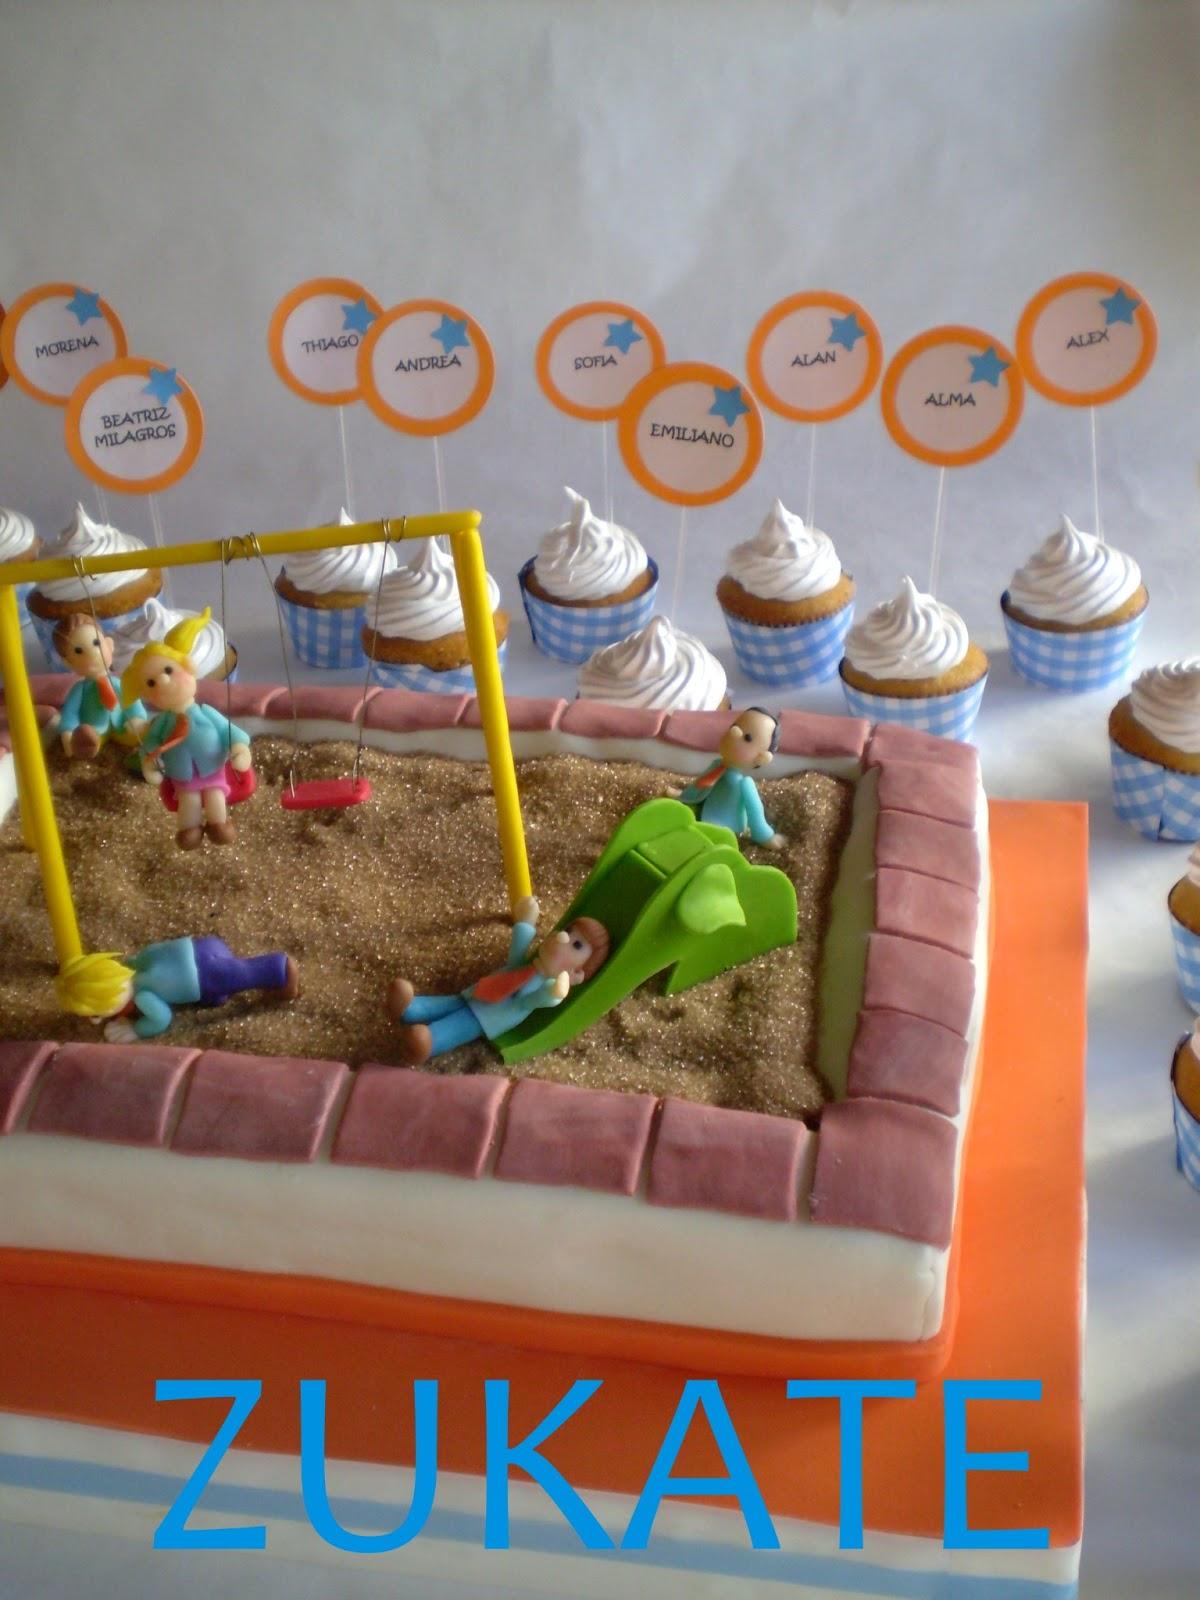 Torta egresaditos jardin de infantes zukate for Decoracion jardin infantes